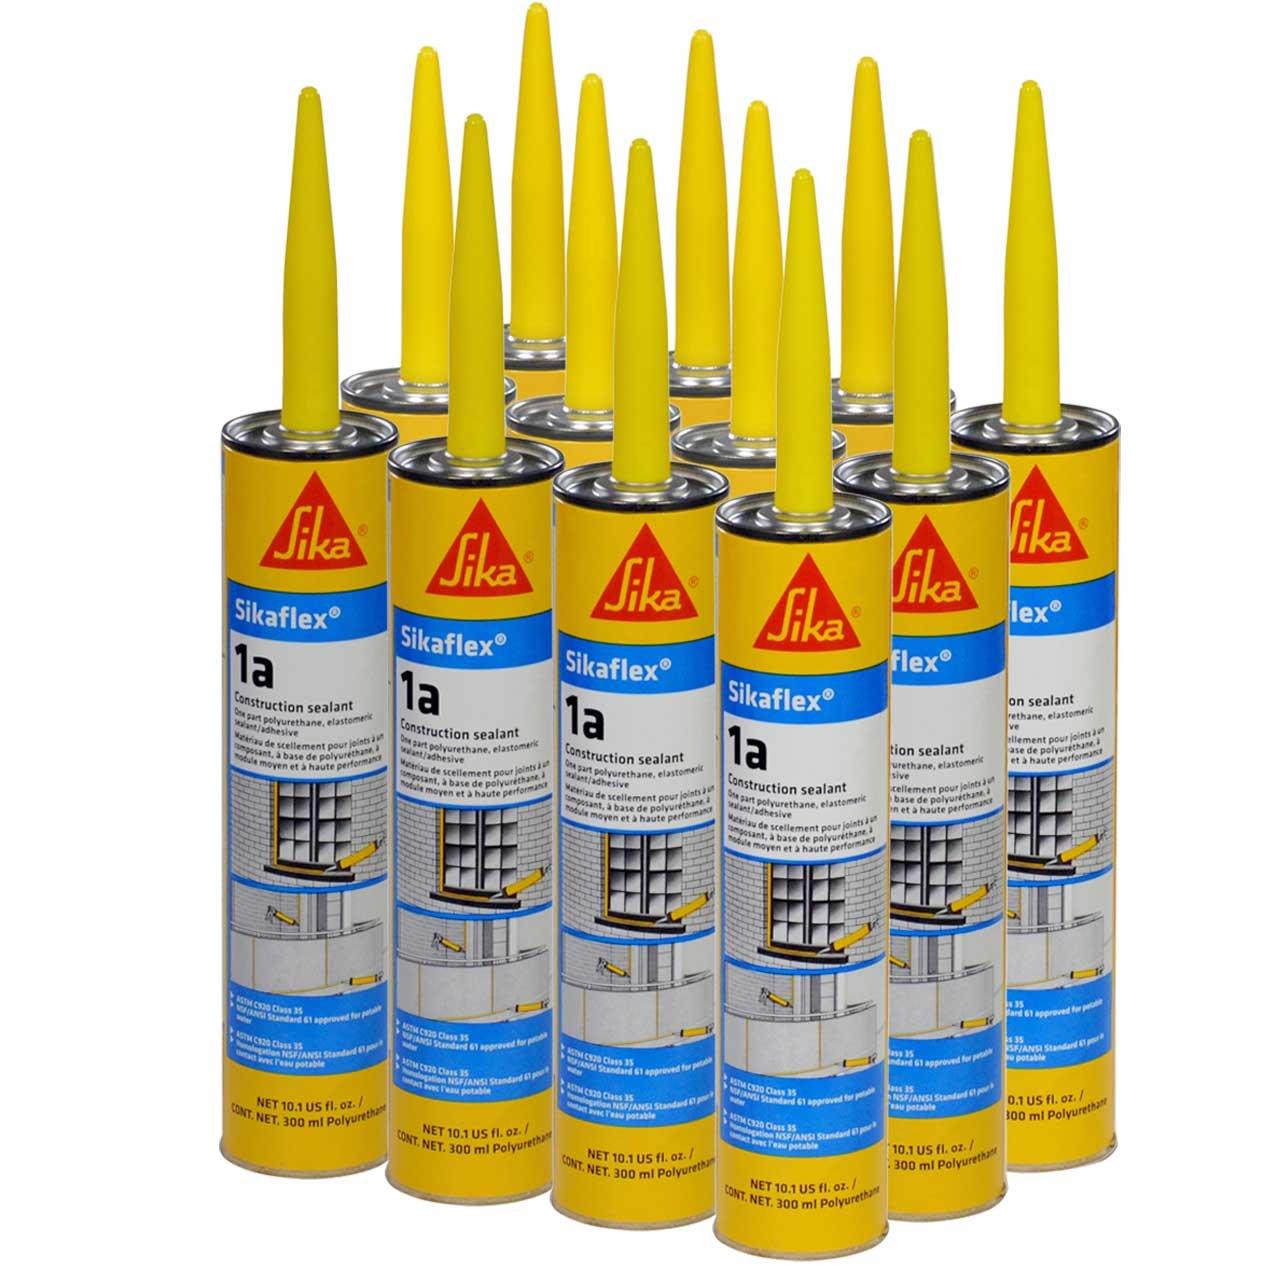 Sikaflex 1A Polyurethane Premium Grade High Performance Elastomeric Sealant, 10.3 fl oz Capacity, Gray, 12 Tubes